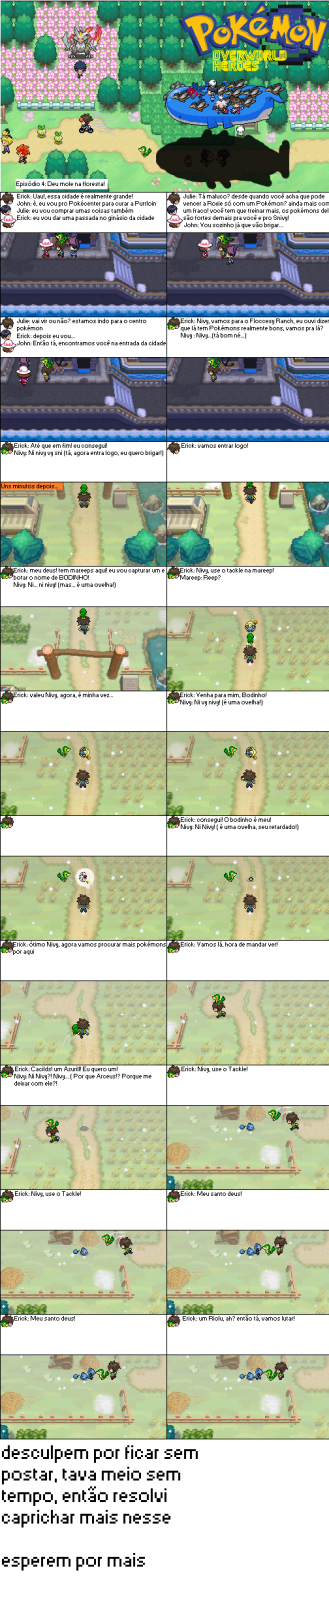 Pokémon Overworld Heroes [+72] 14m5coo